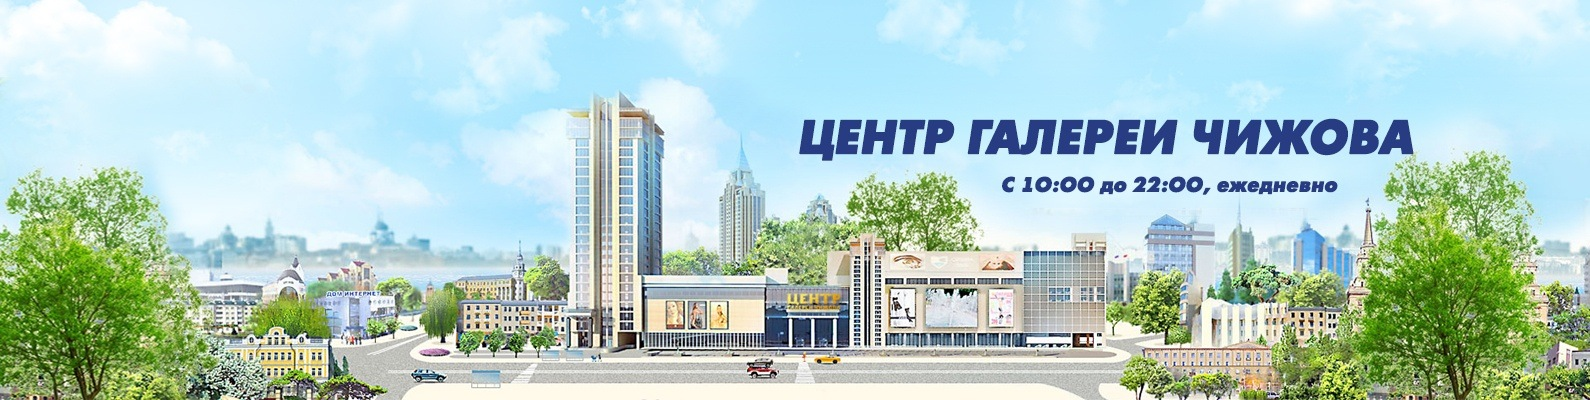 3f289fbc Центр Галереи Чижова | Воронеж | ВКонтакте